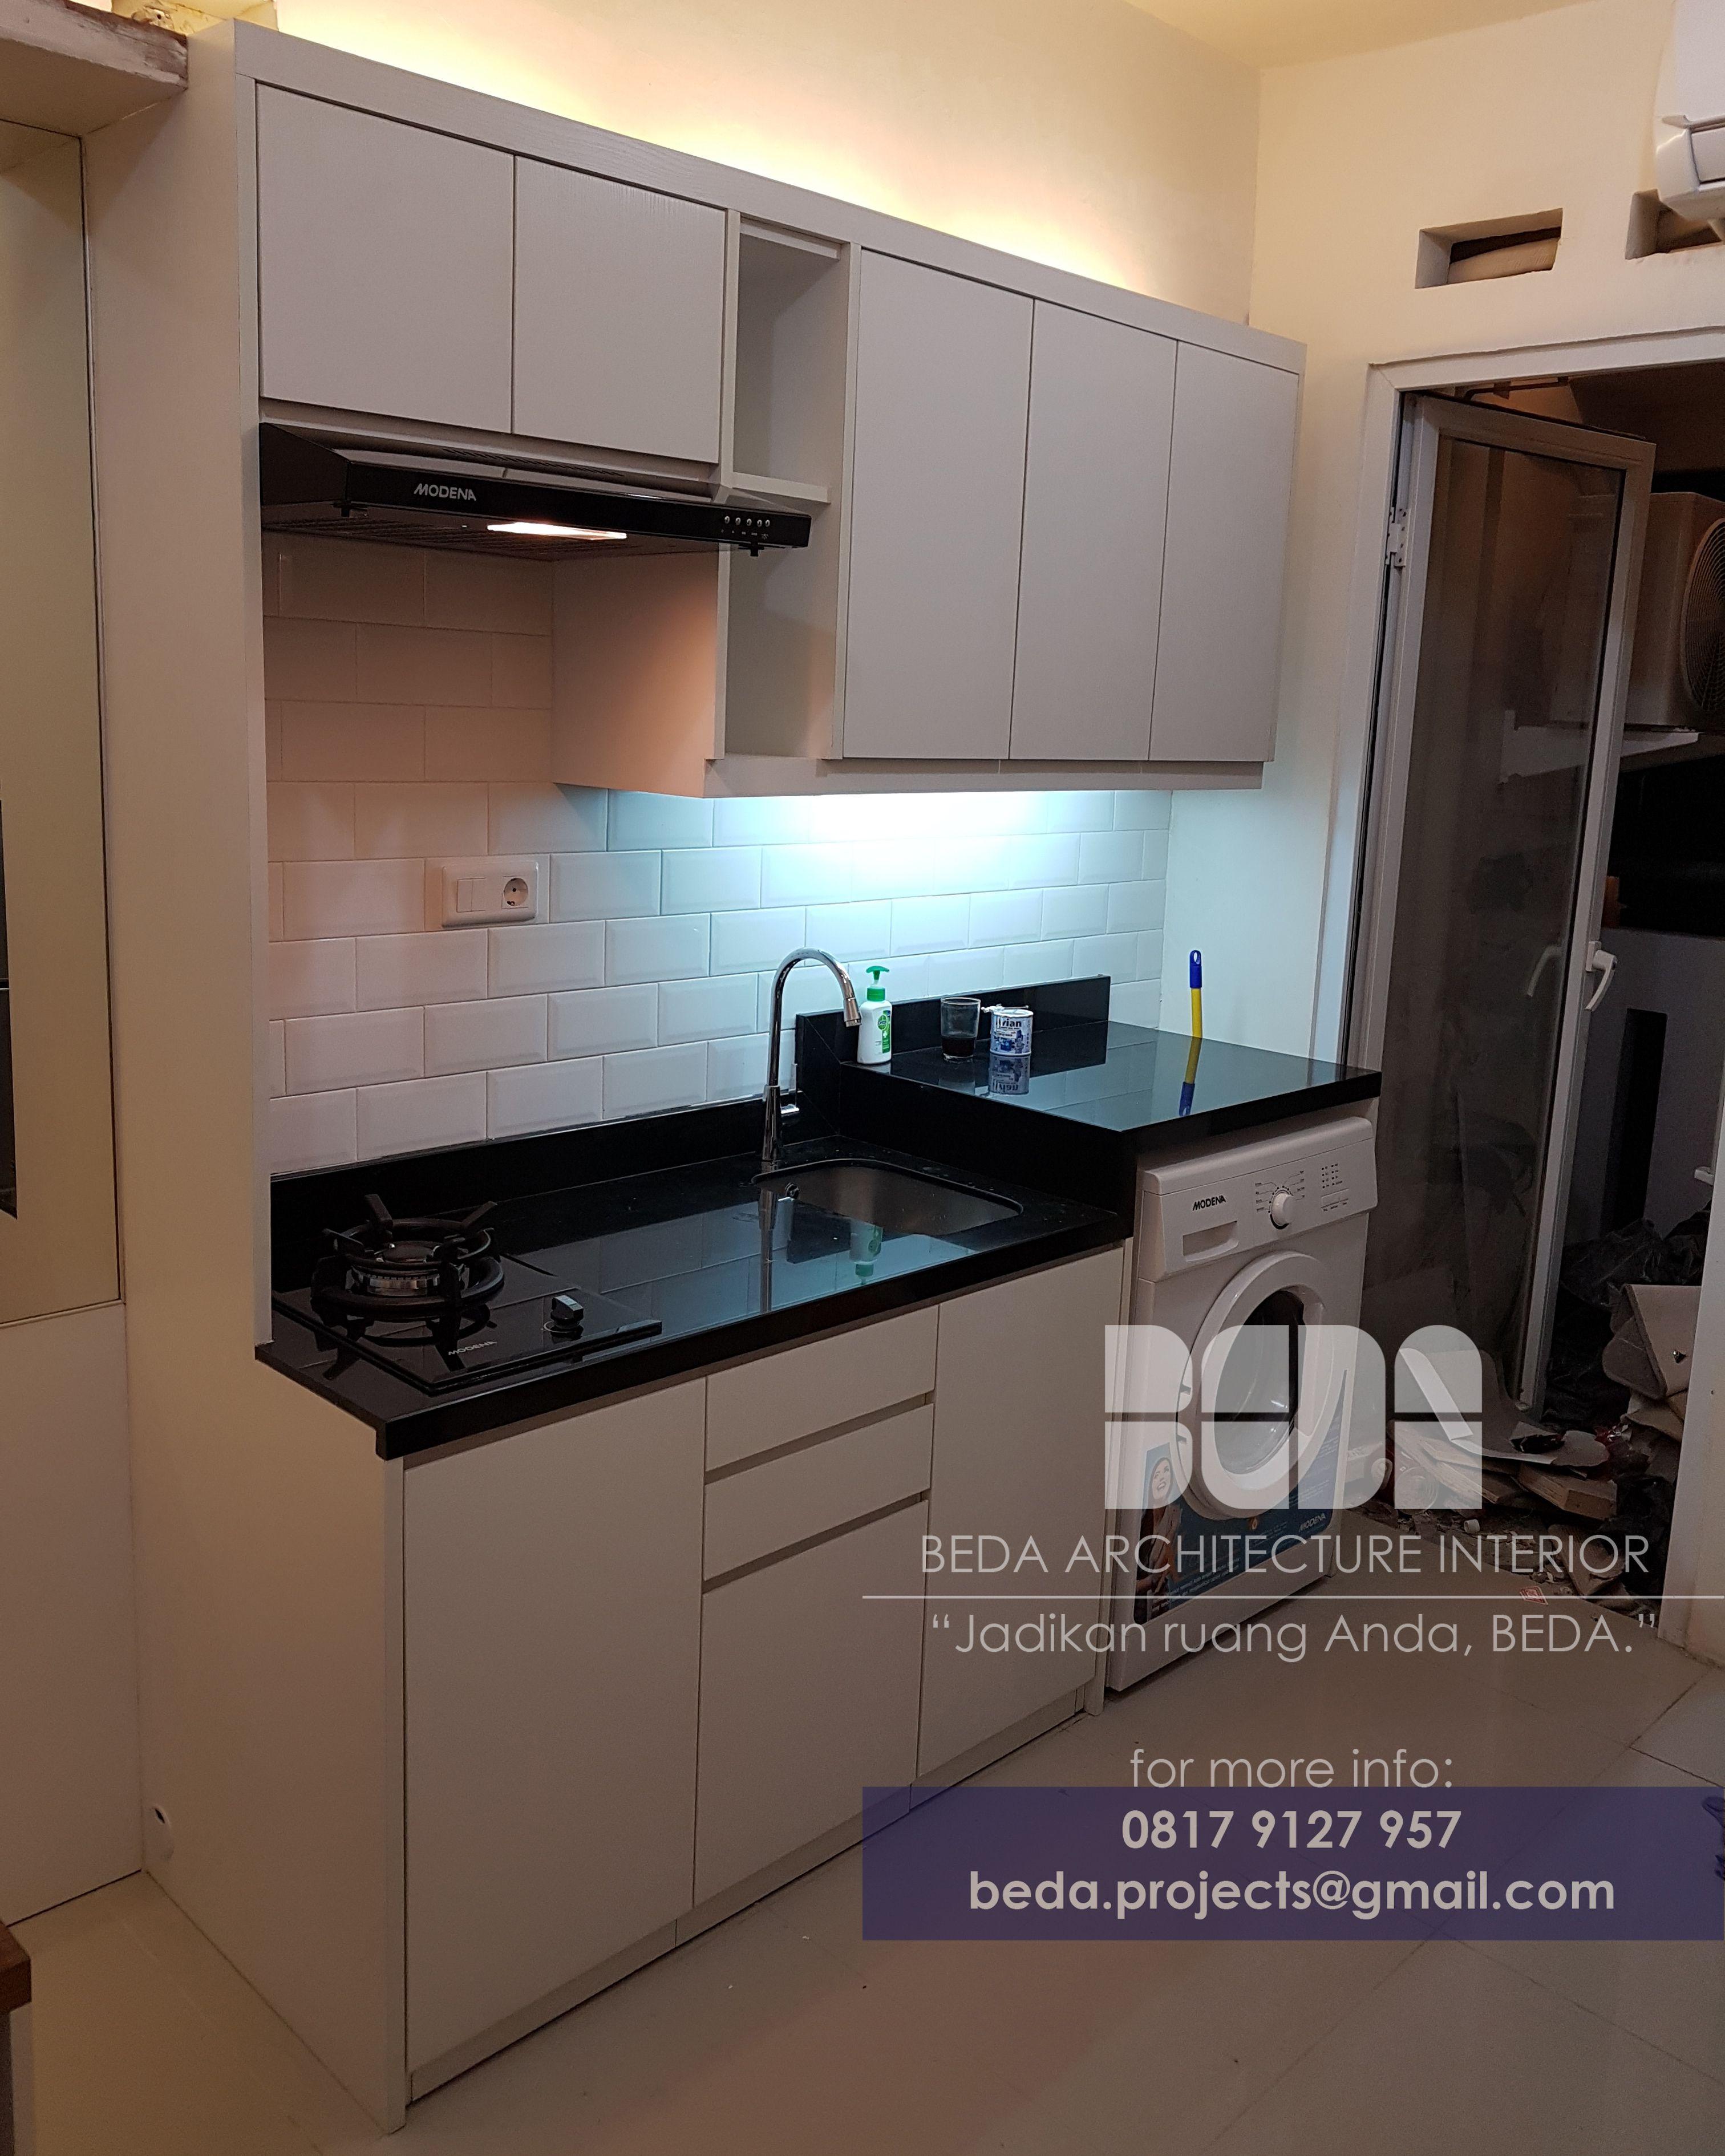 Kabinet Pantry Dan Mesin Cuci Untuk Memaksimalkan Fungsi Ruangan